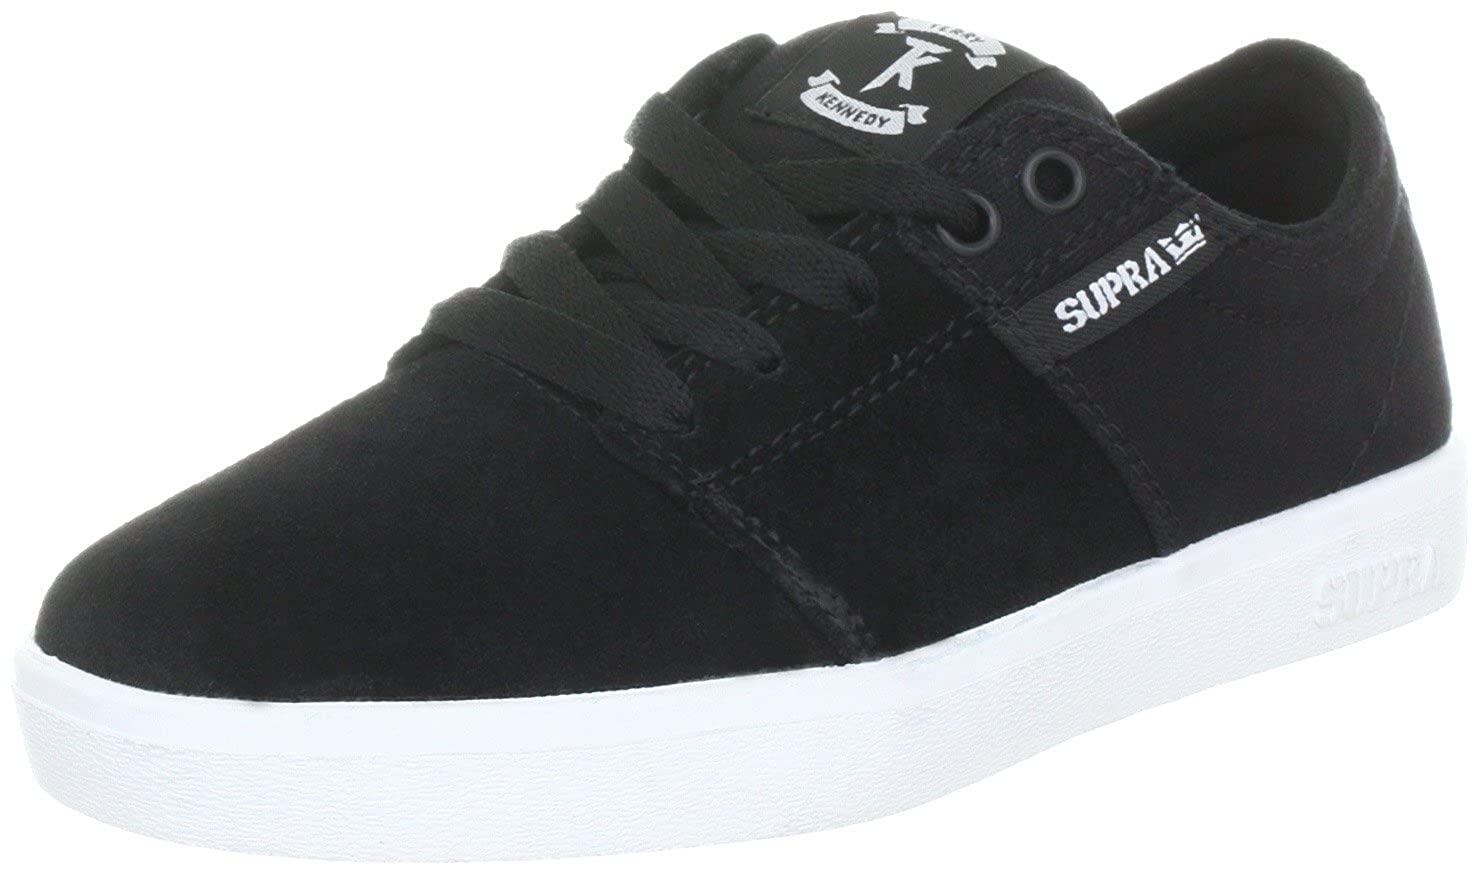 f36e1b18774a ... Amazon.com Supra TK Low Stacks Skate Shoe - Men s Fashion Sneakers   Falcon Black ...